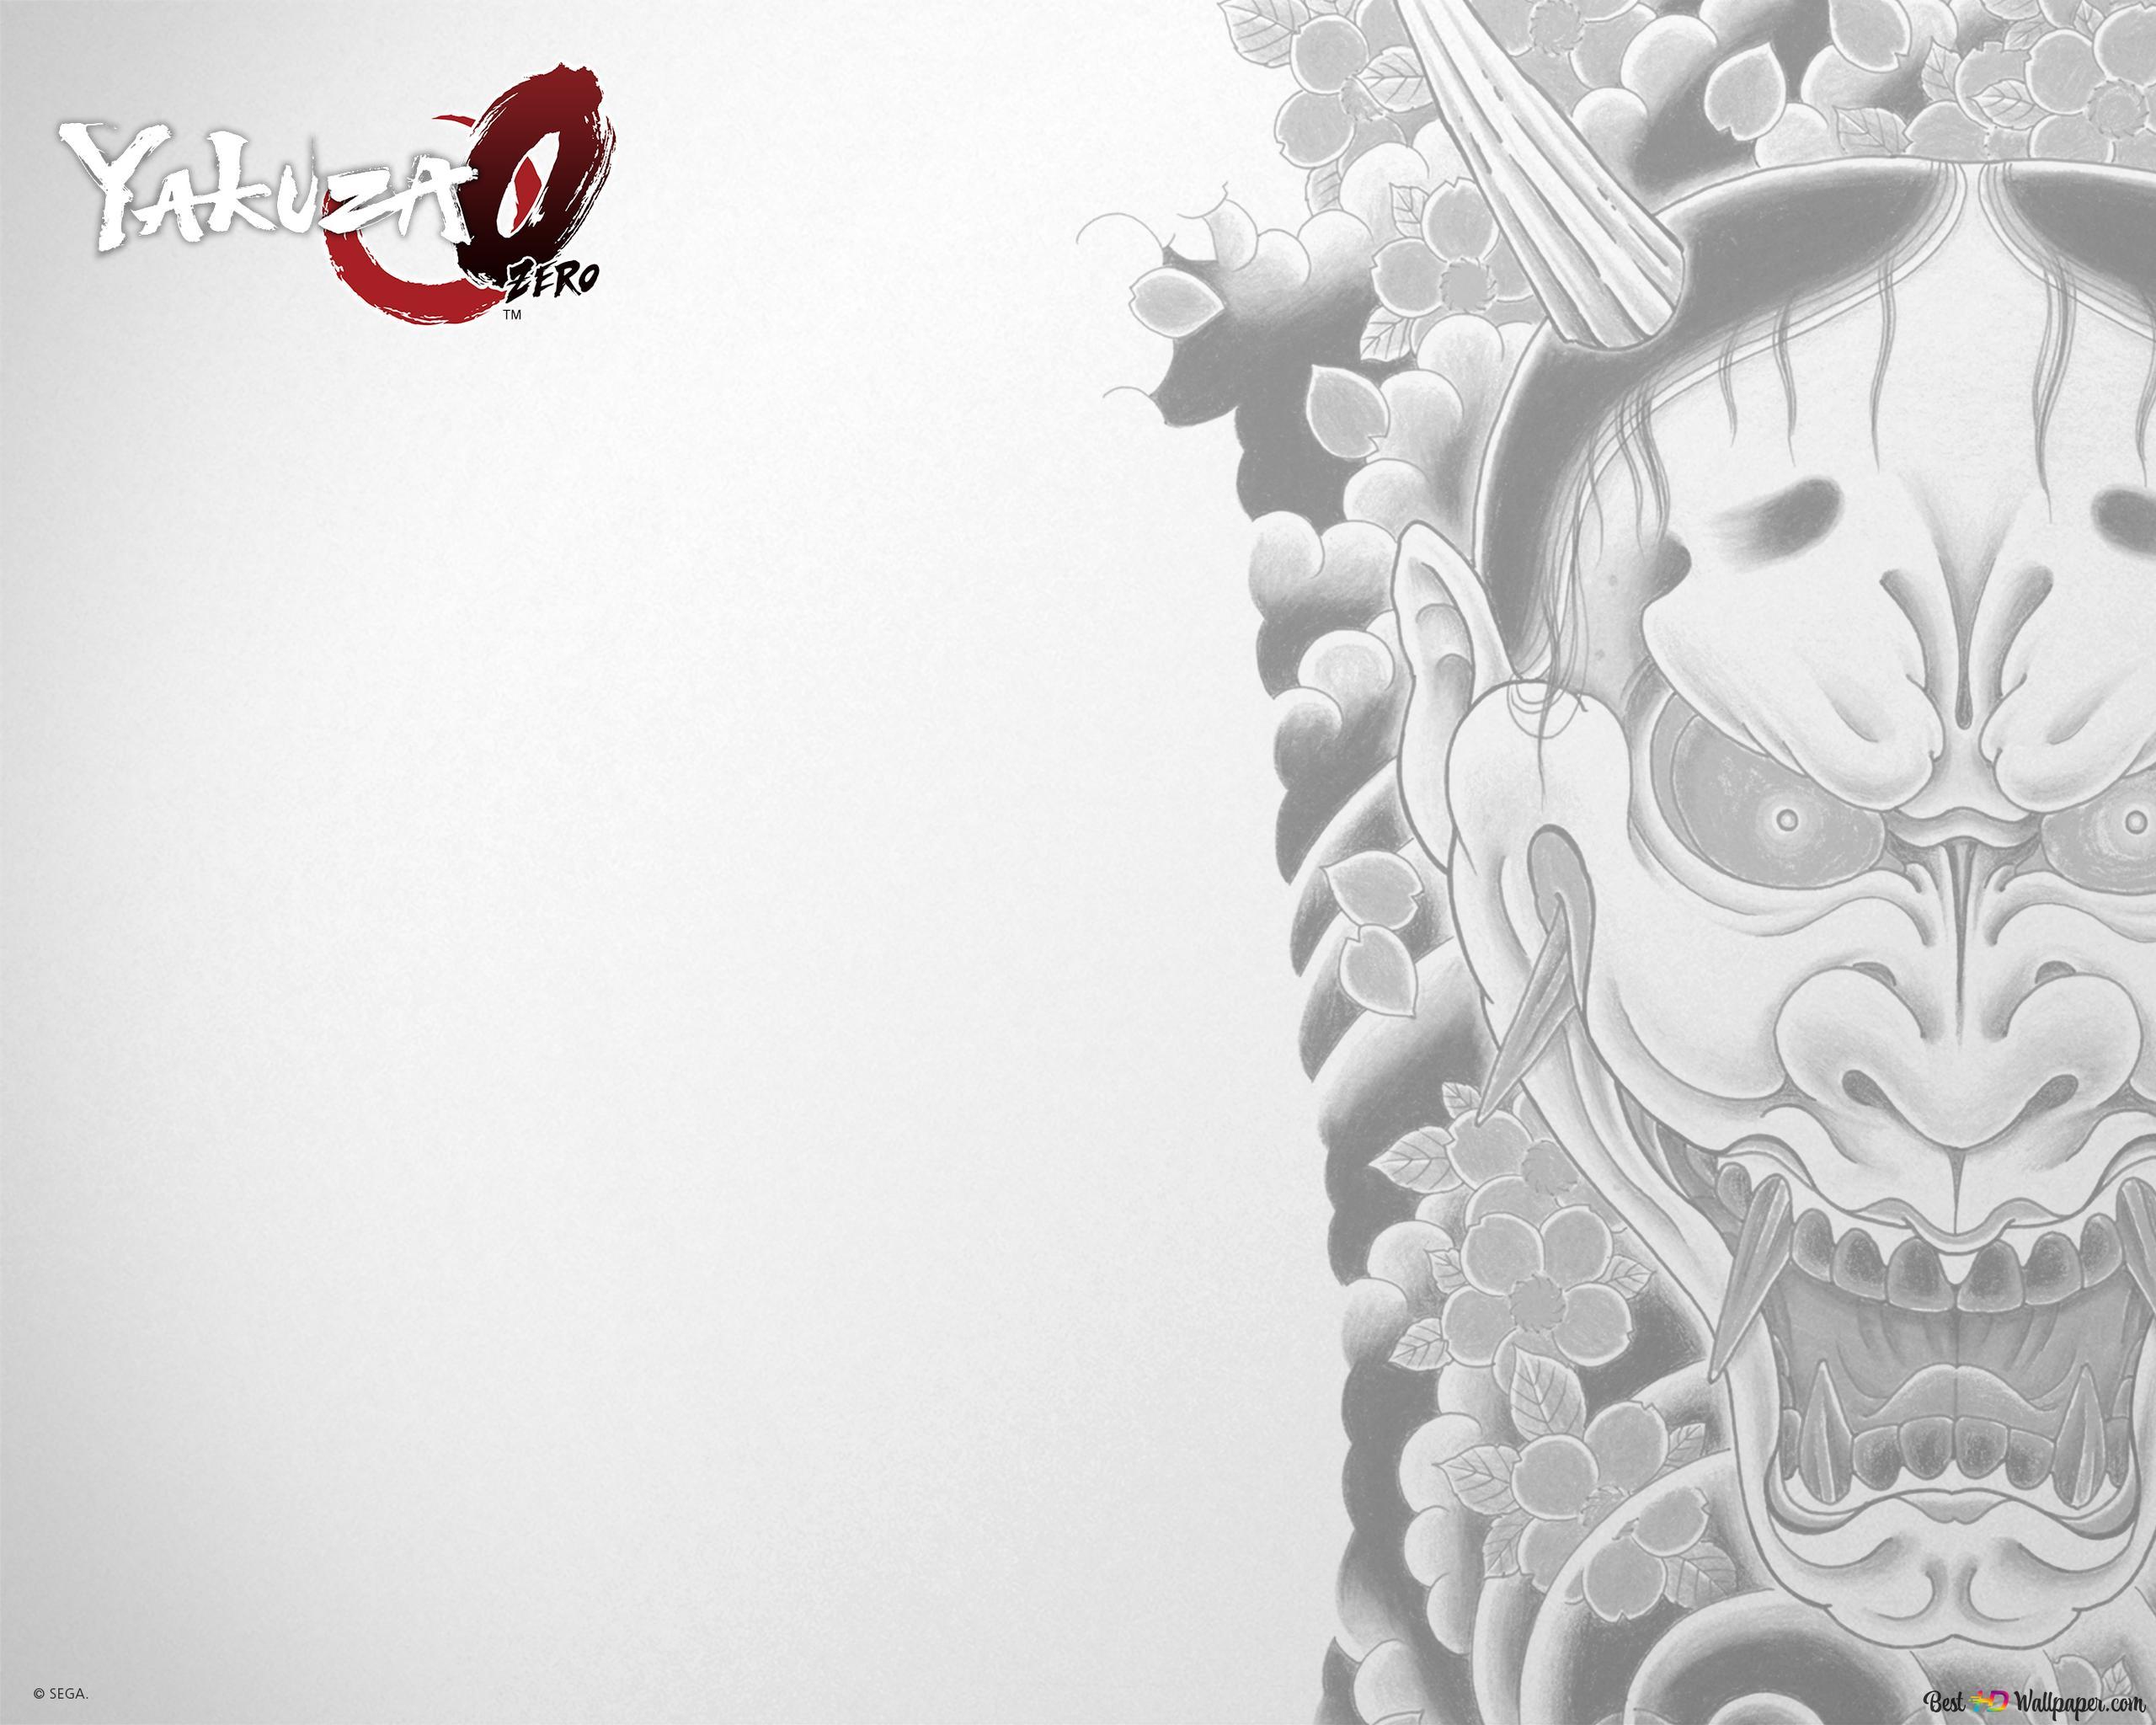 Yakuza Dragon Tattoo Wallpaper